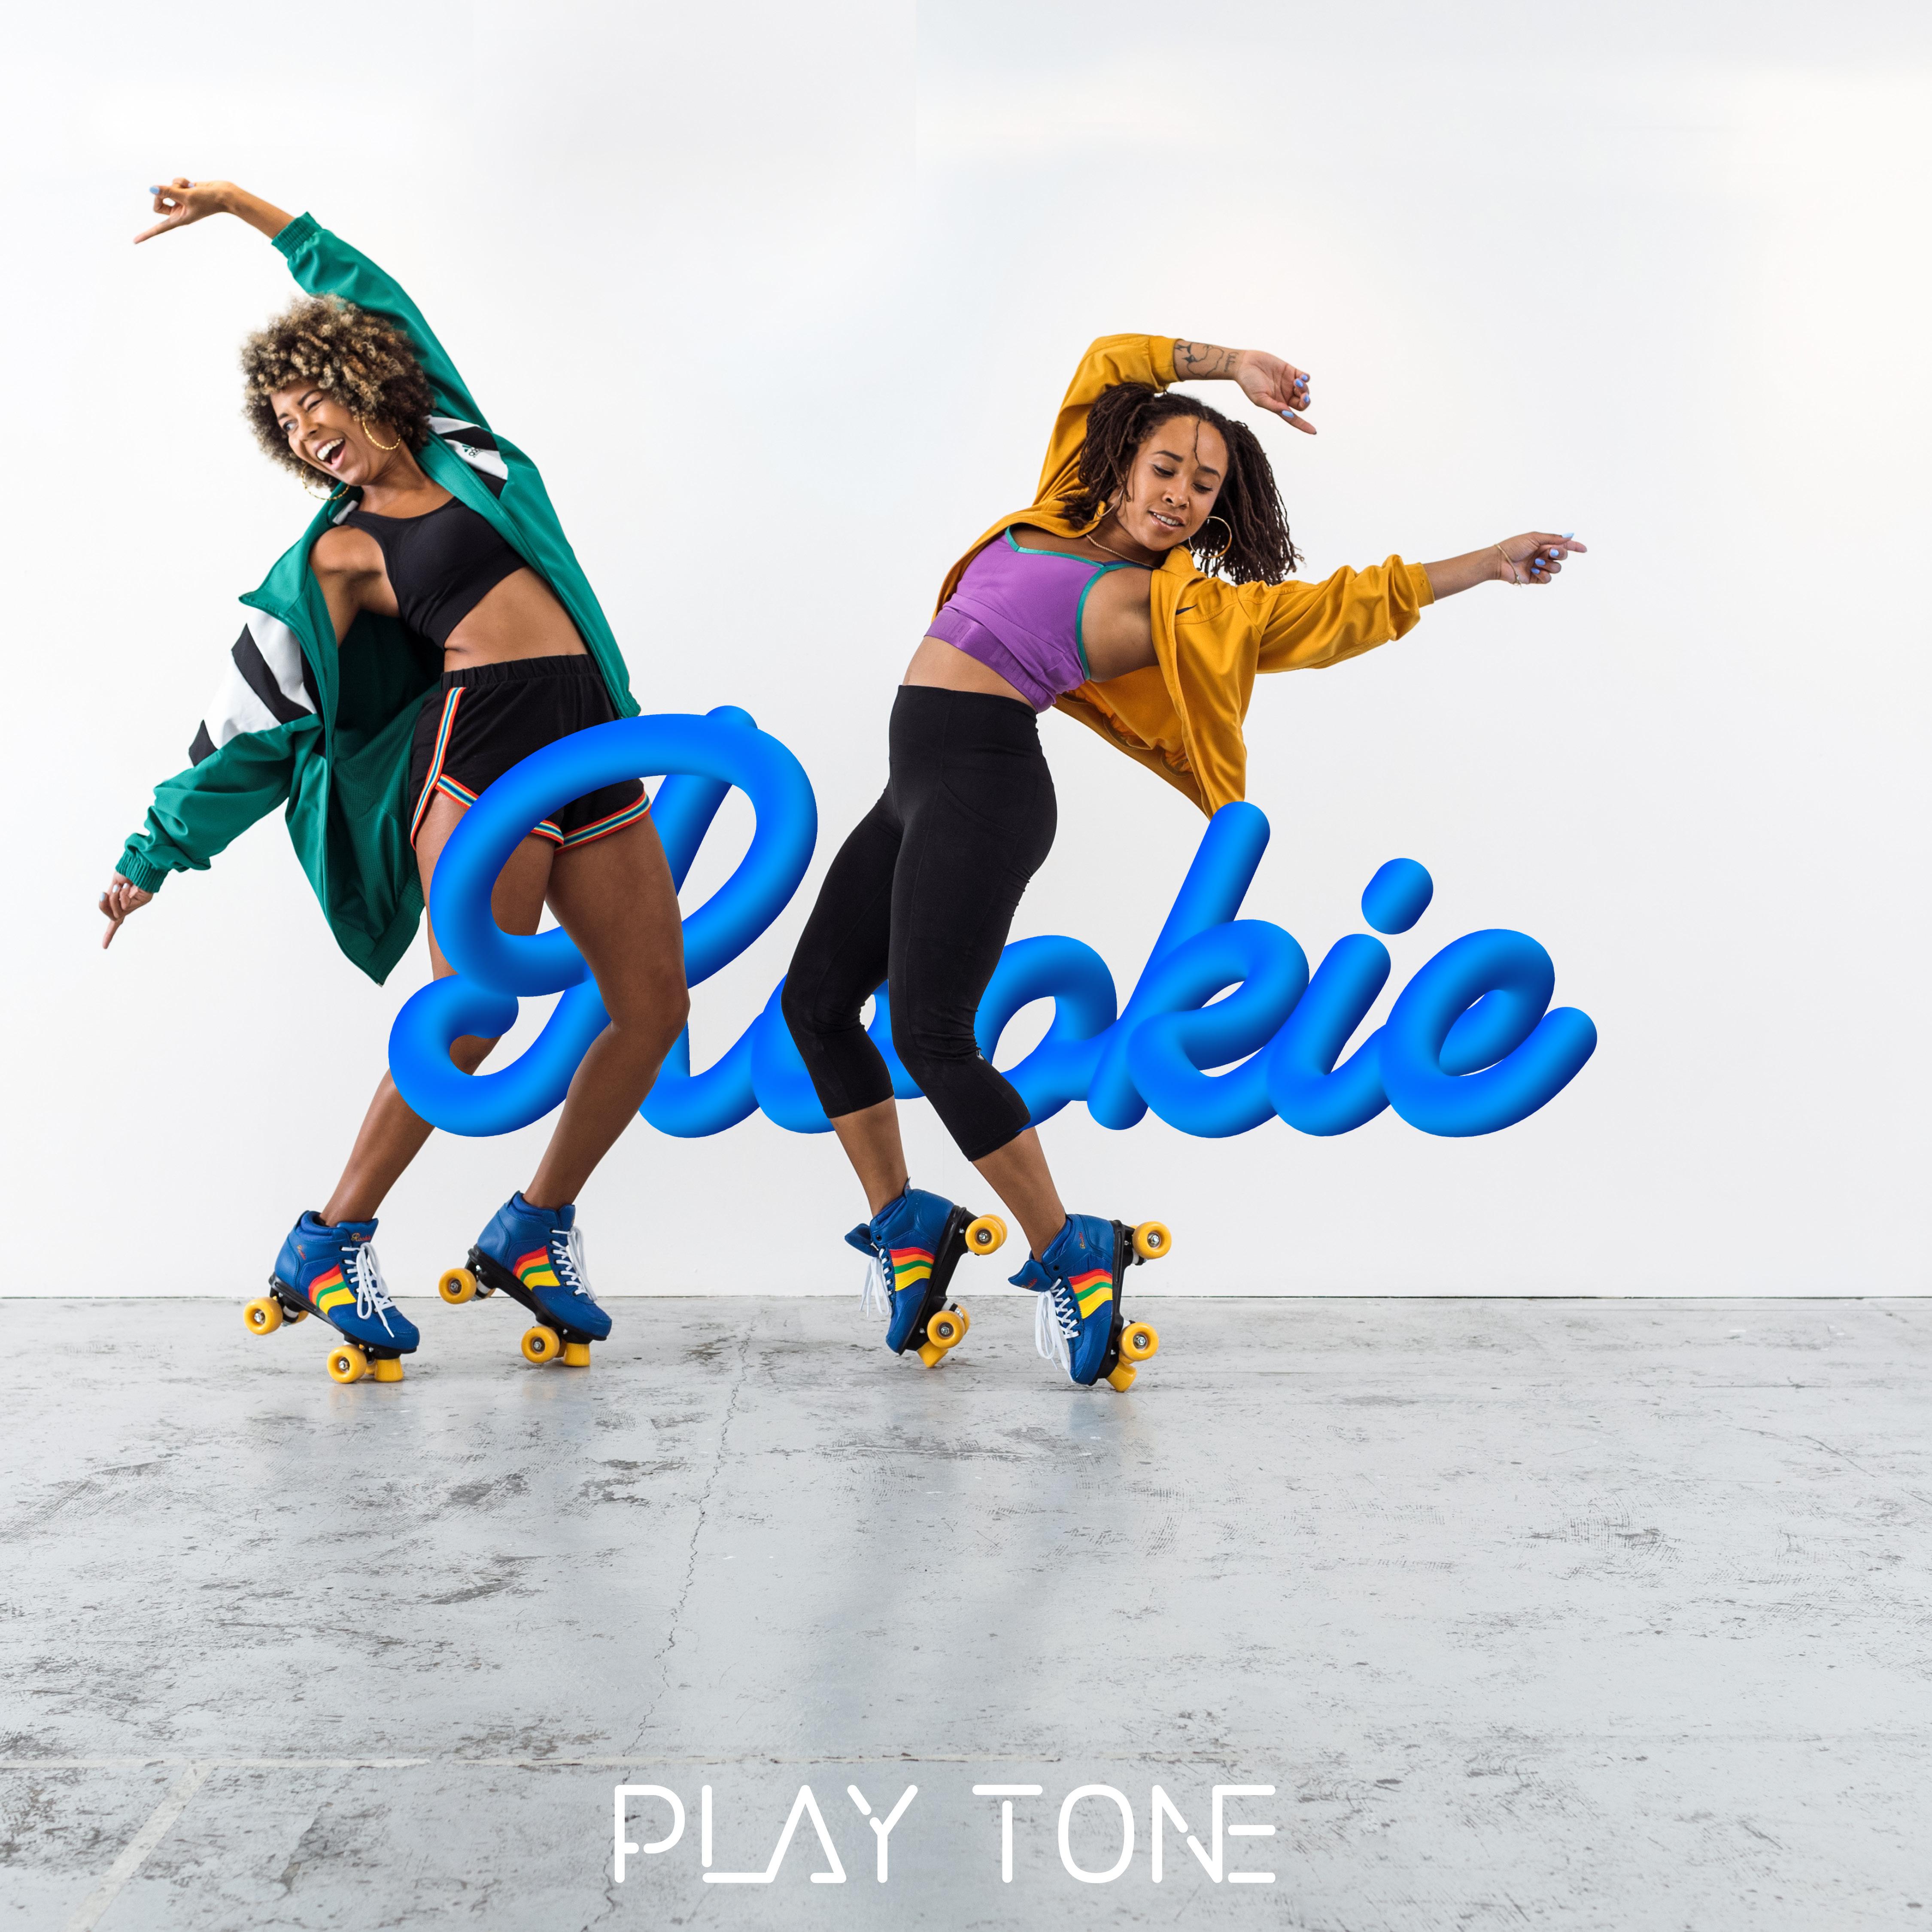 Play tone partnerships - Rookie Skates